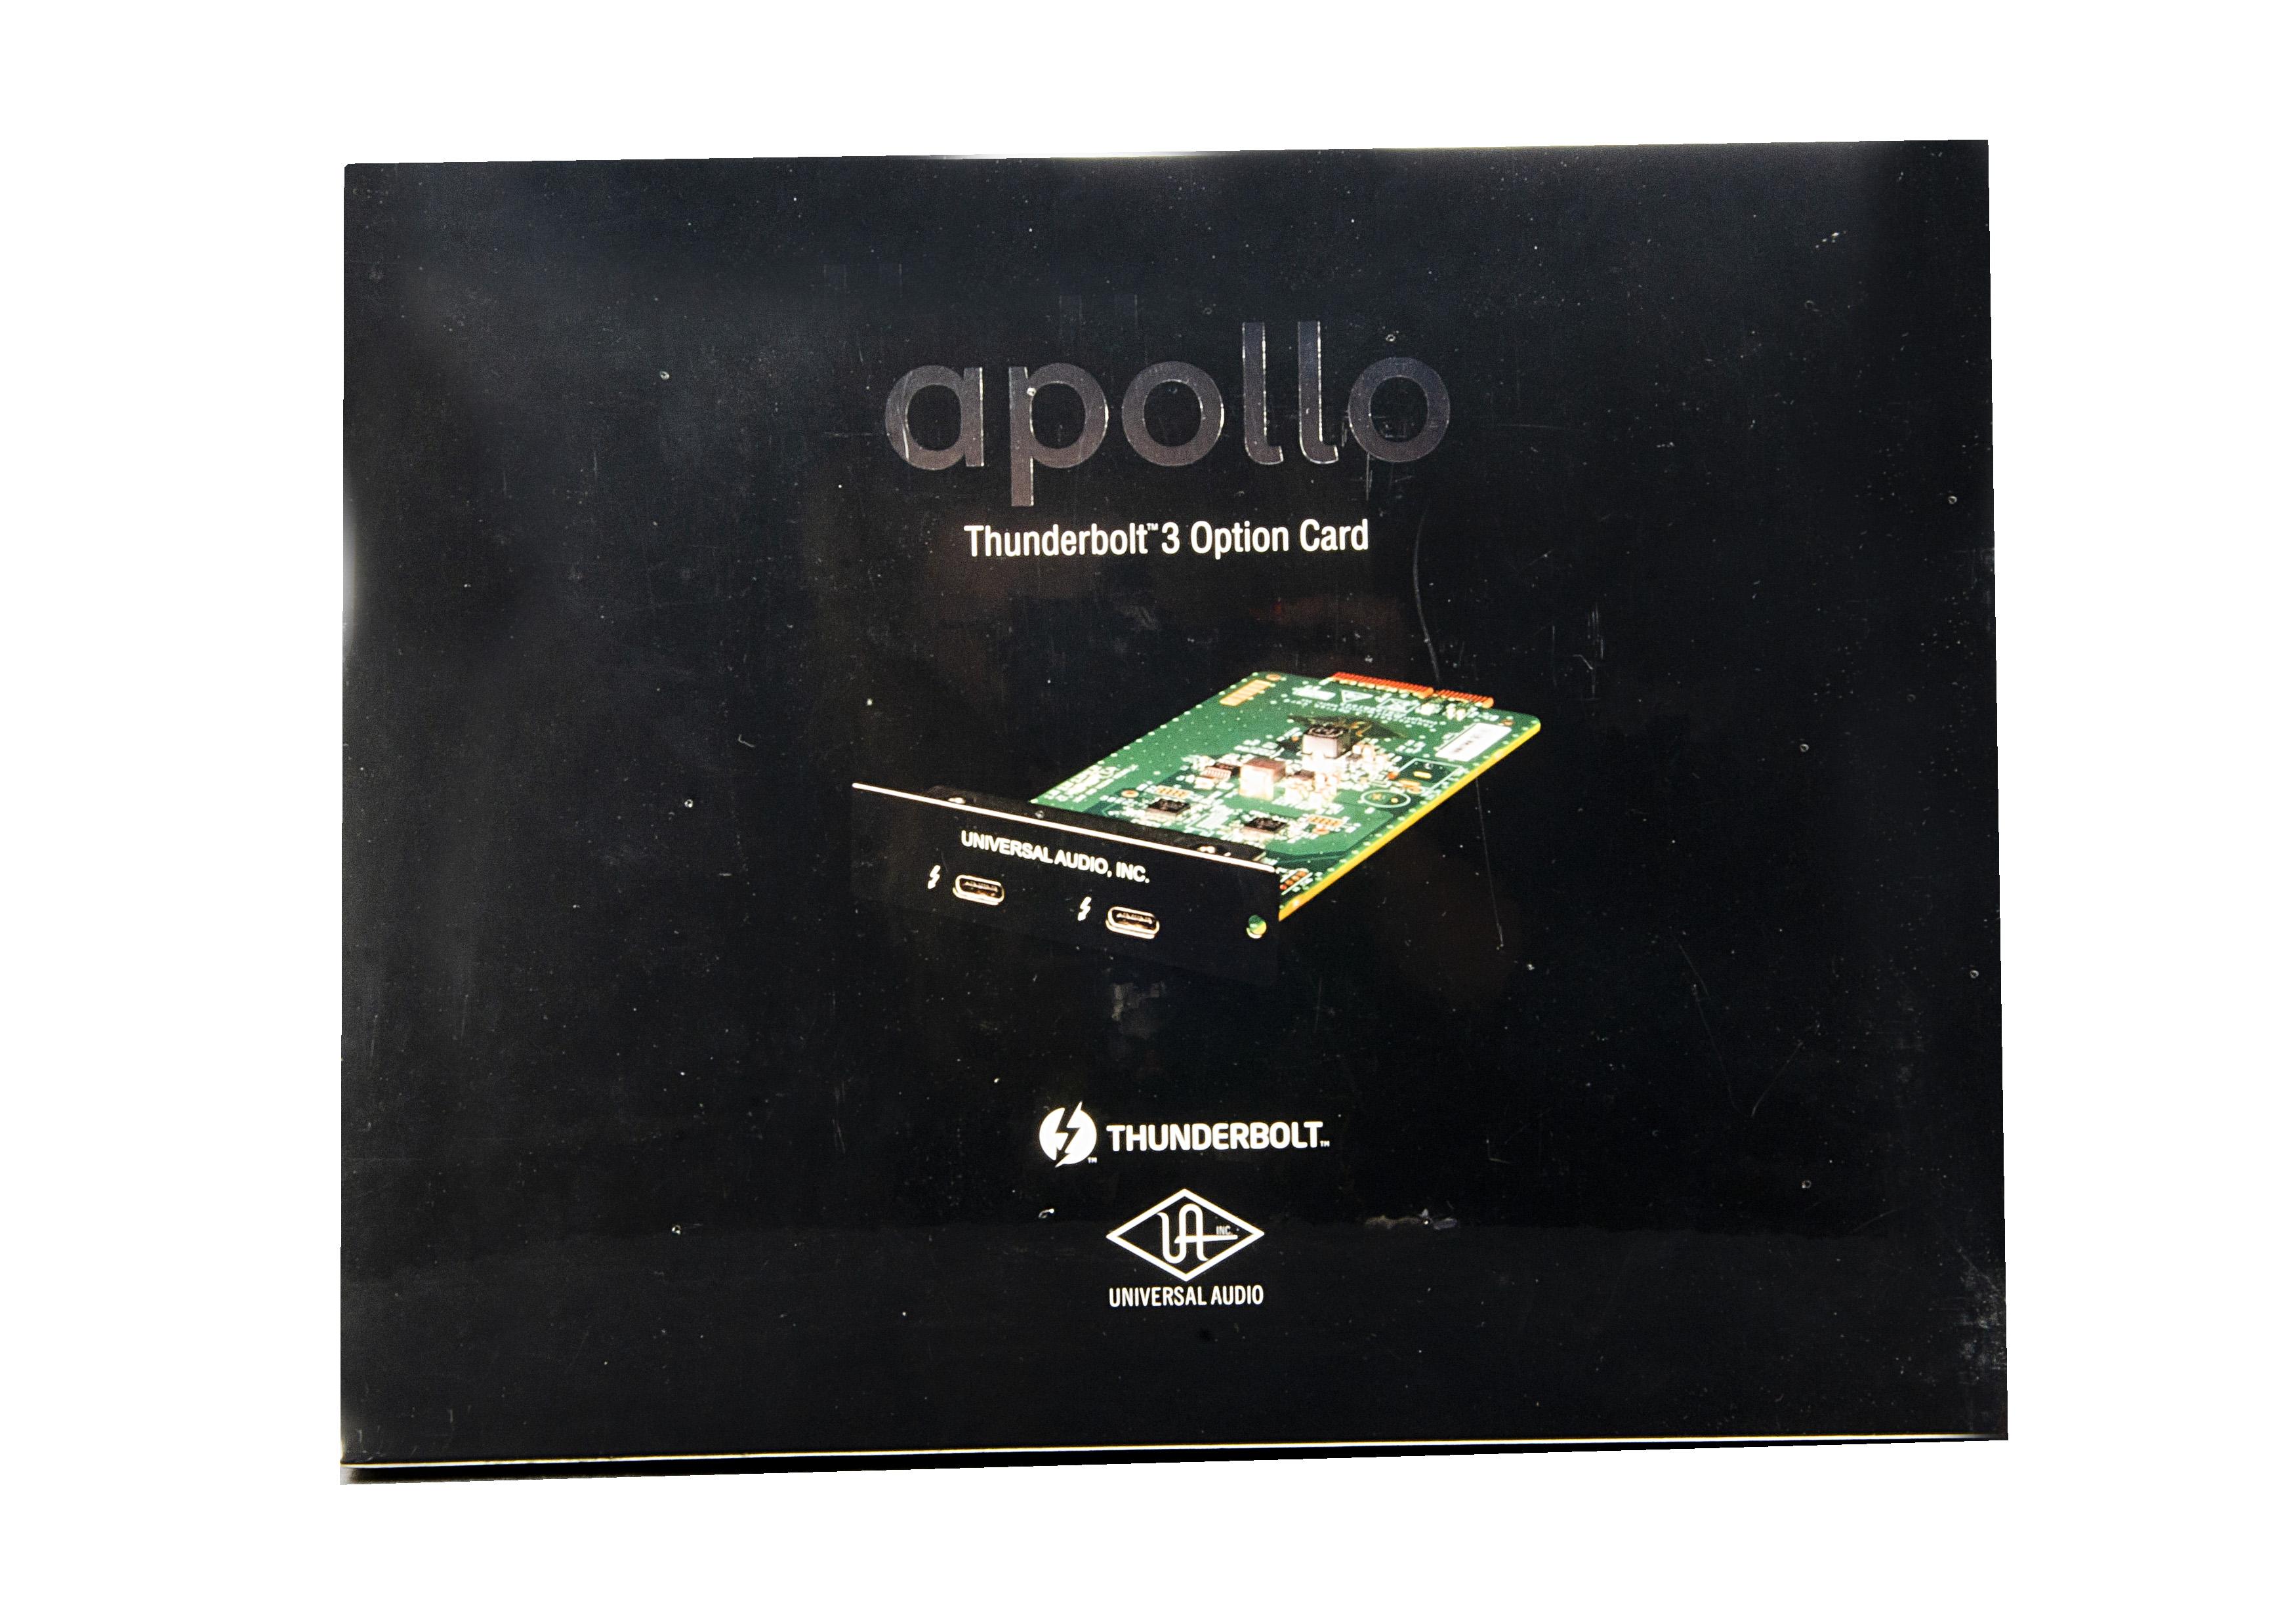 Apollo Option Card, unopened Thunderbolt 3 Universal audio option card